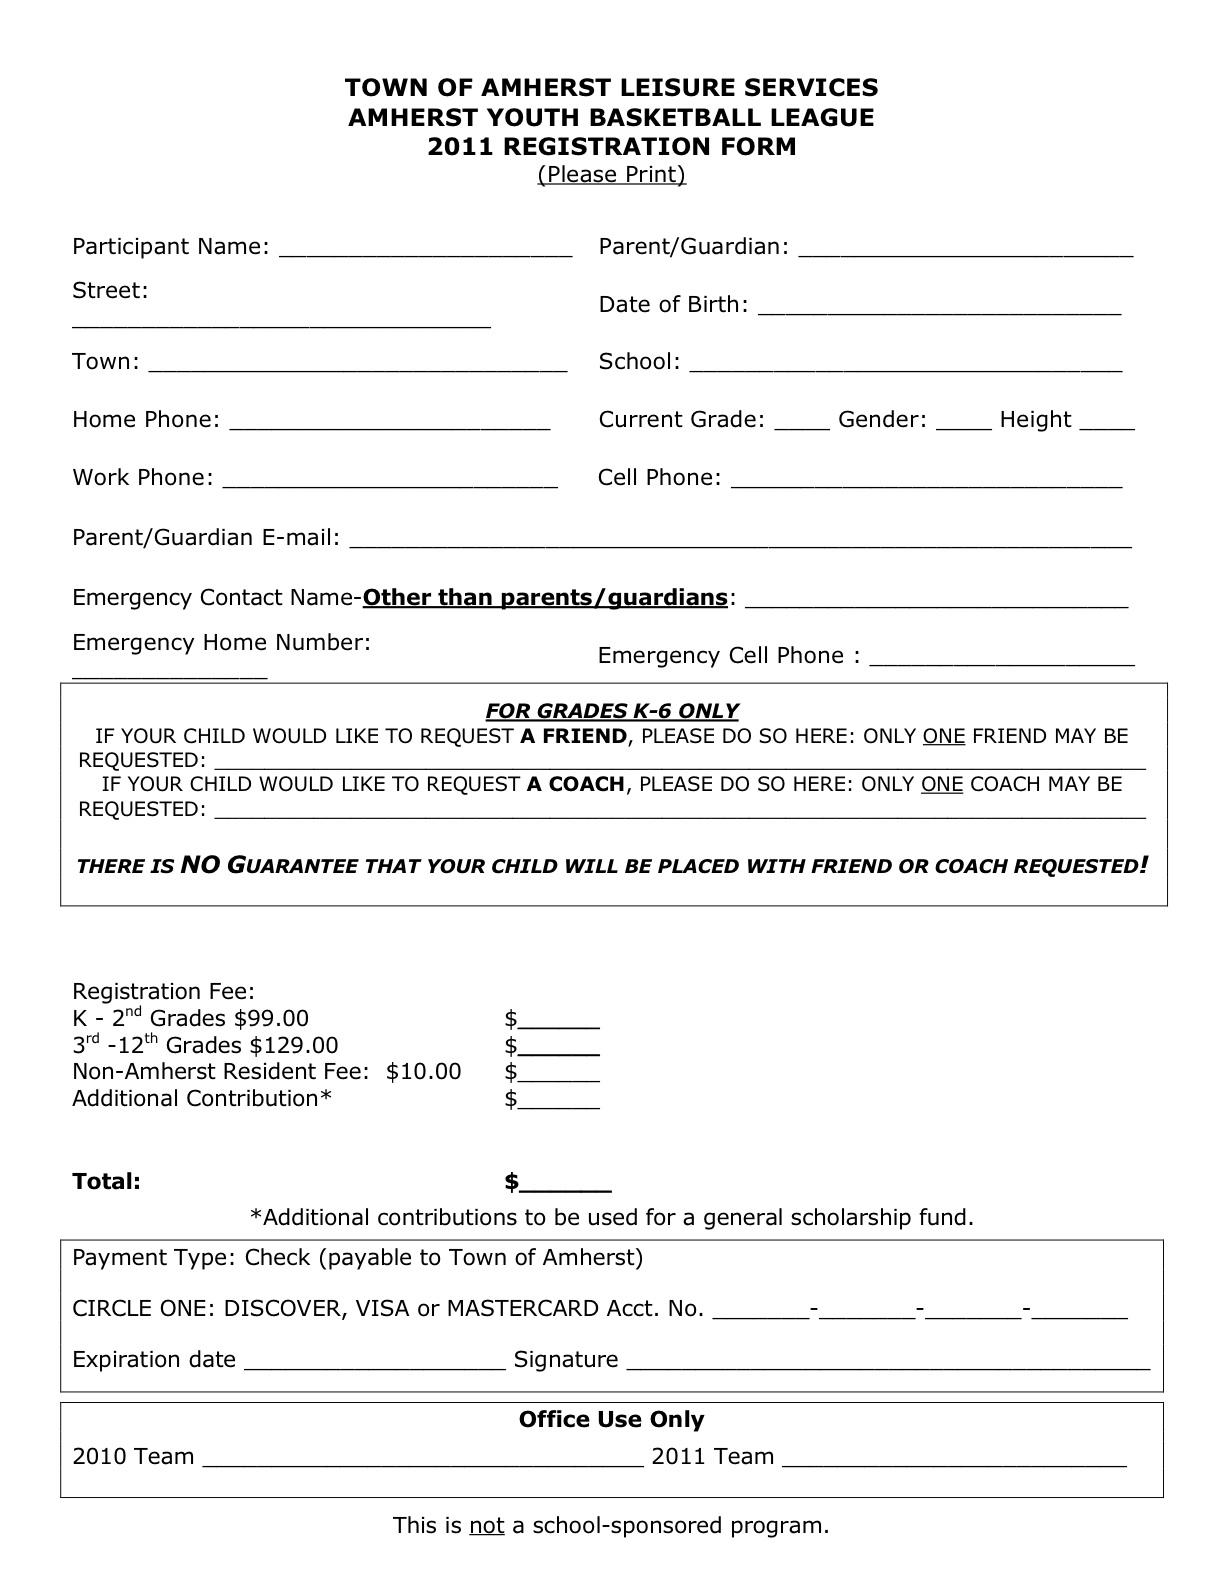 Sport Registration Form Template best photos of registration form – Registration Form Template Microsoft